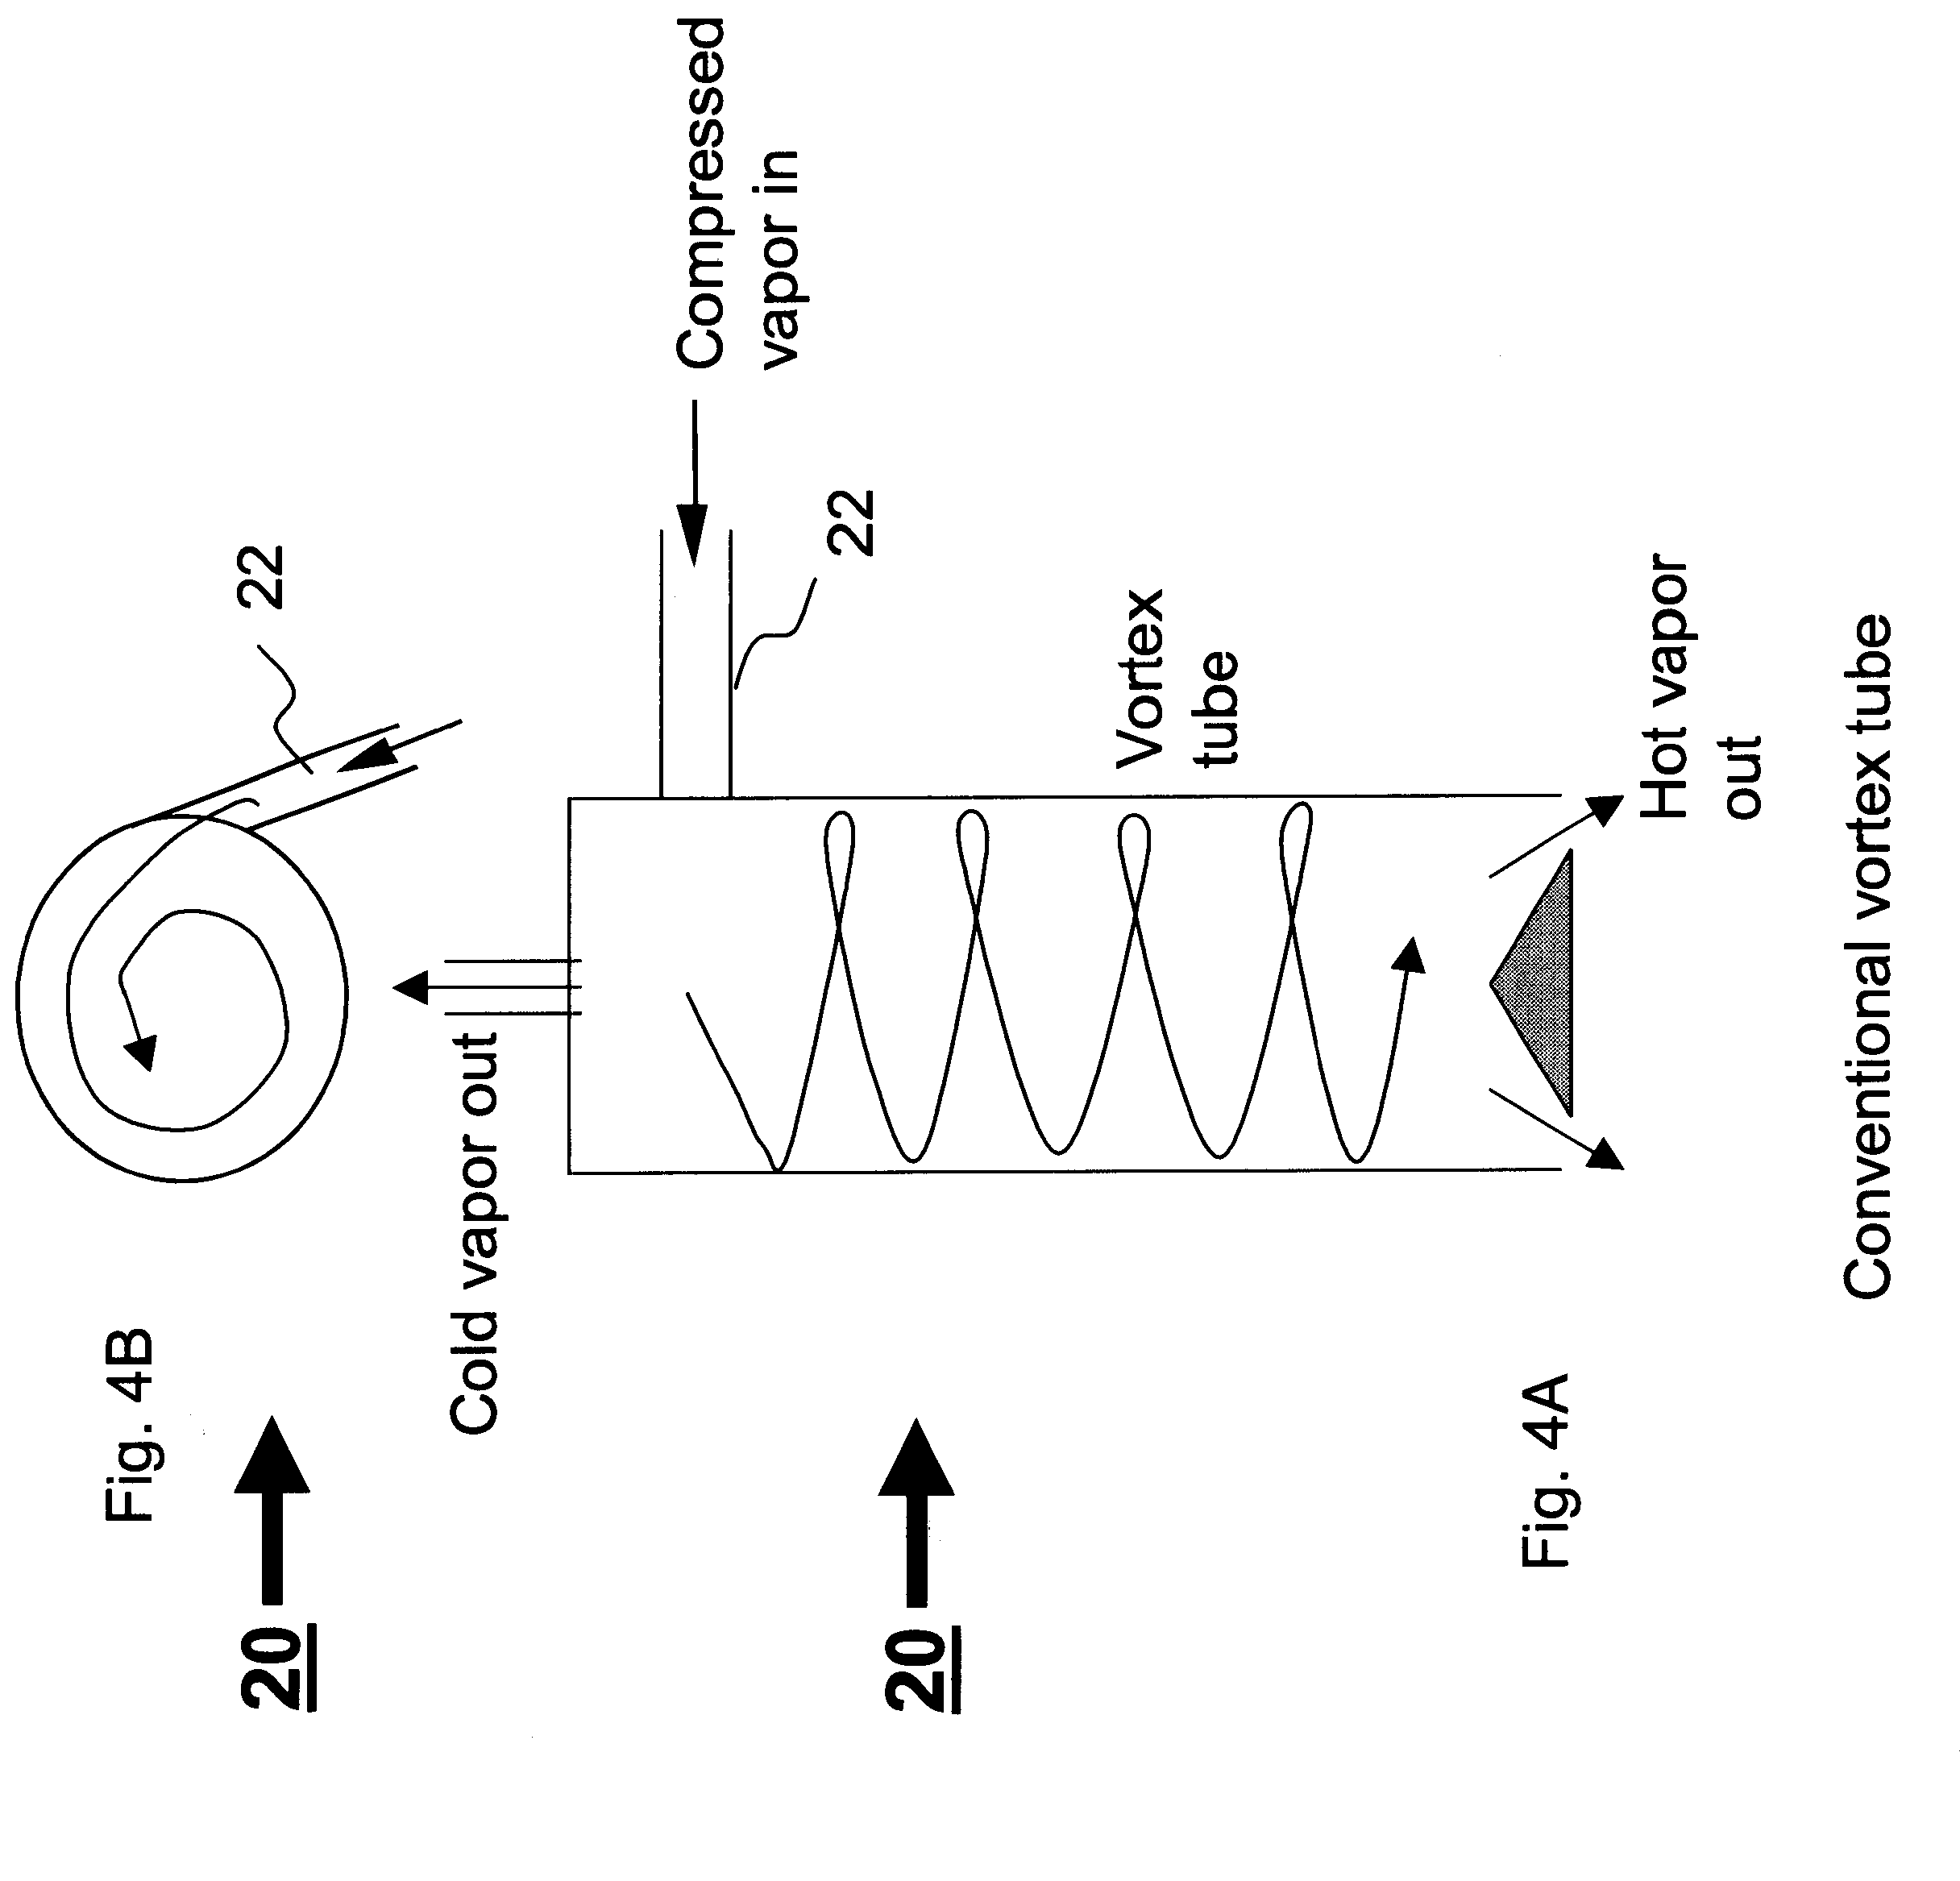 Refrigeration Cycle Intercooling Baek et al Refrigeration Cycle